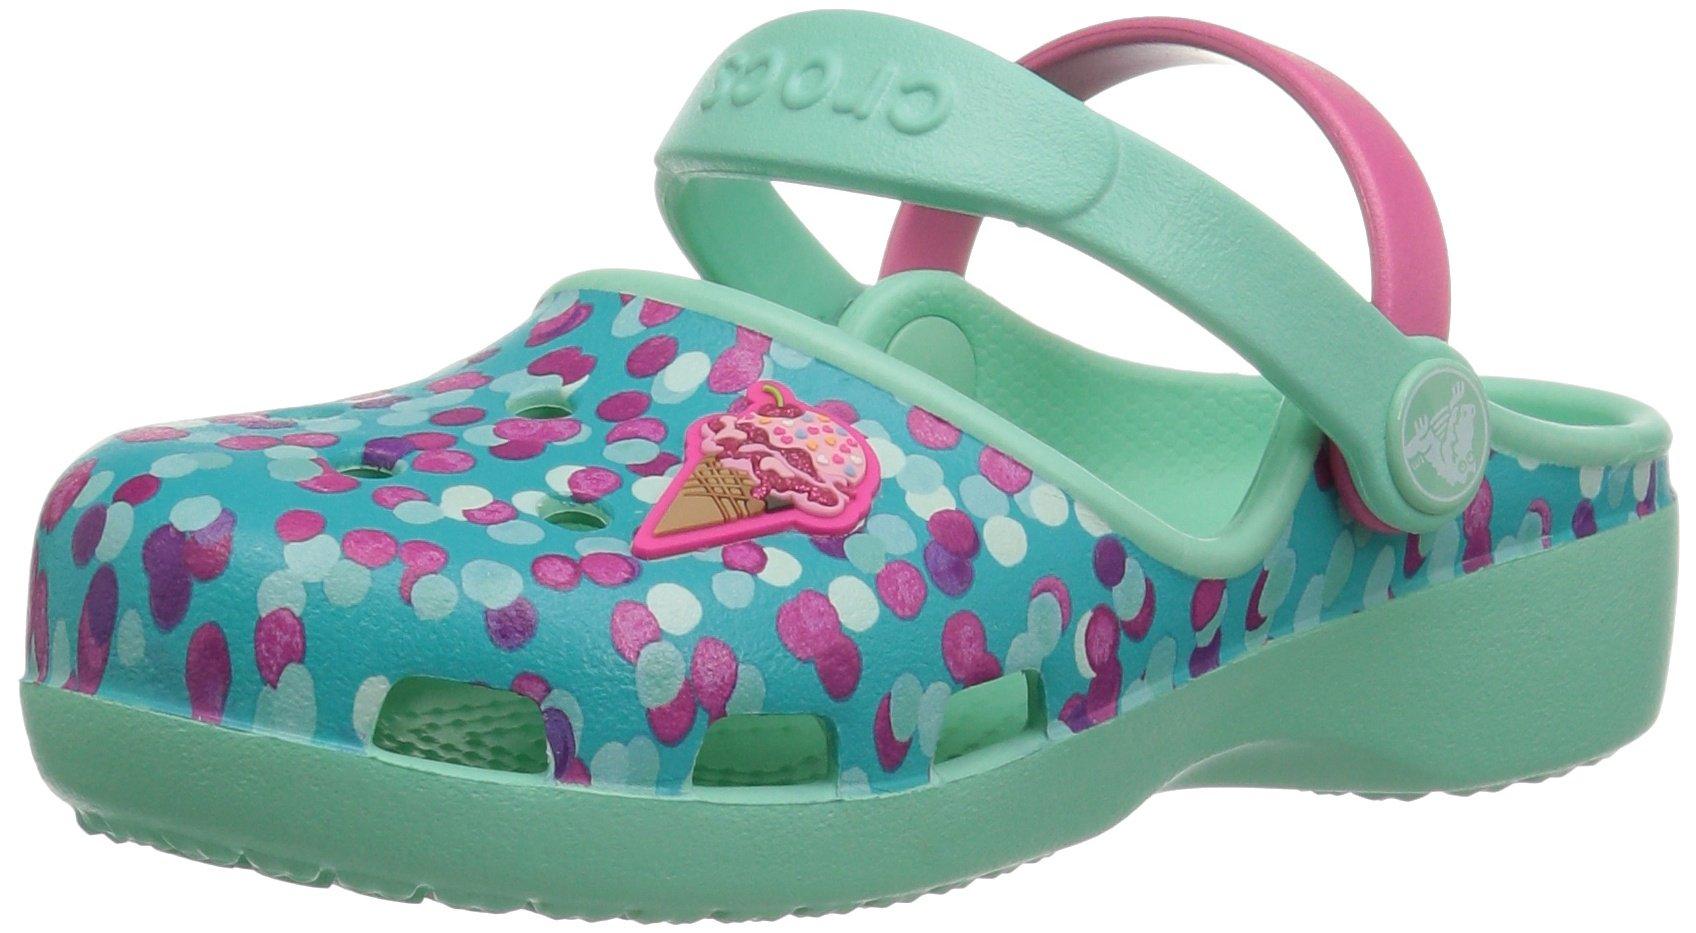 Crocs Girls Karin Novelty Clog K, Mint, 1 M US Little Kid